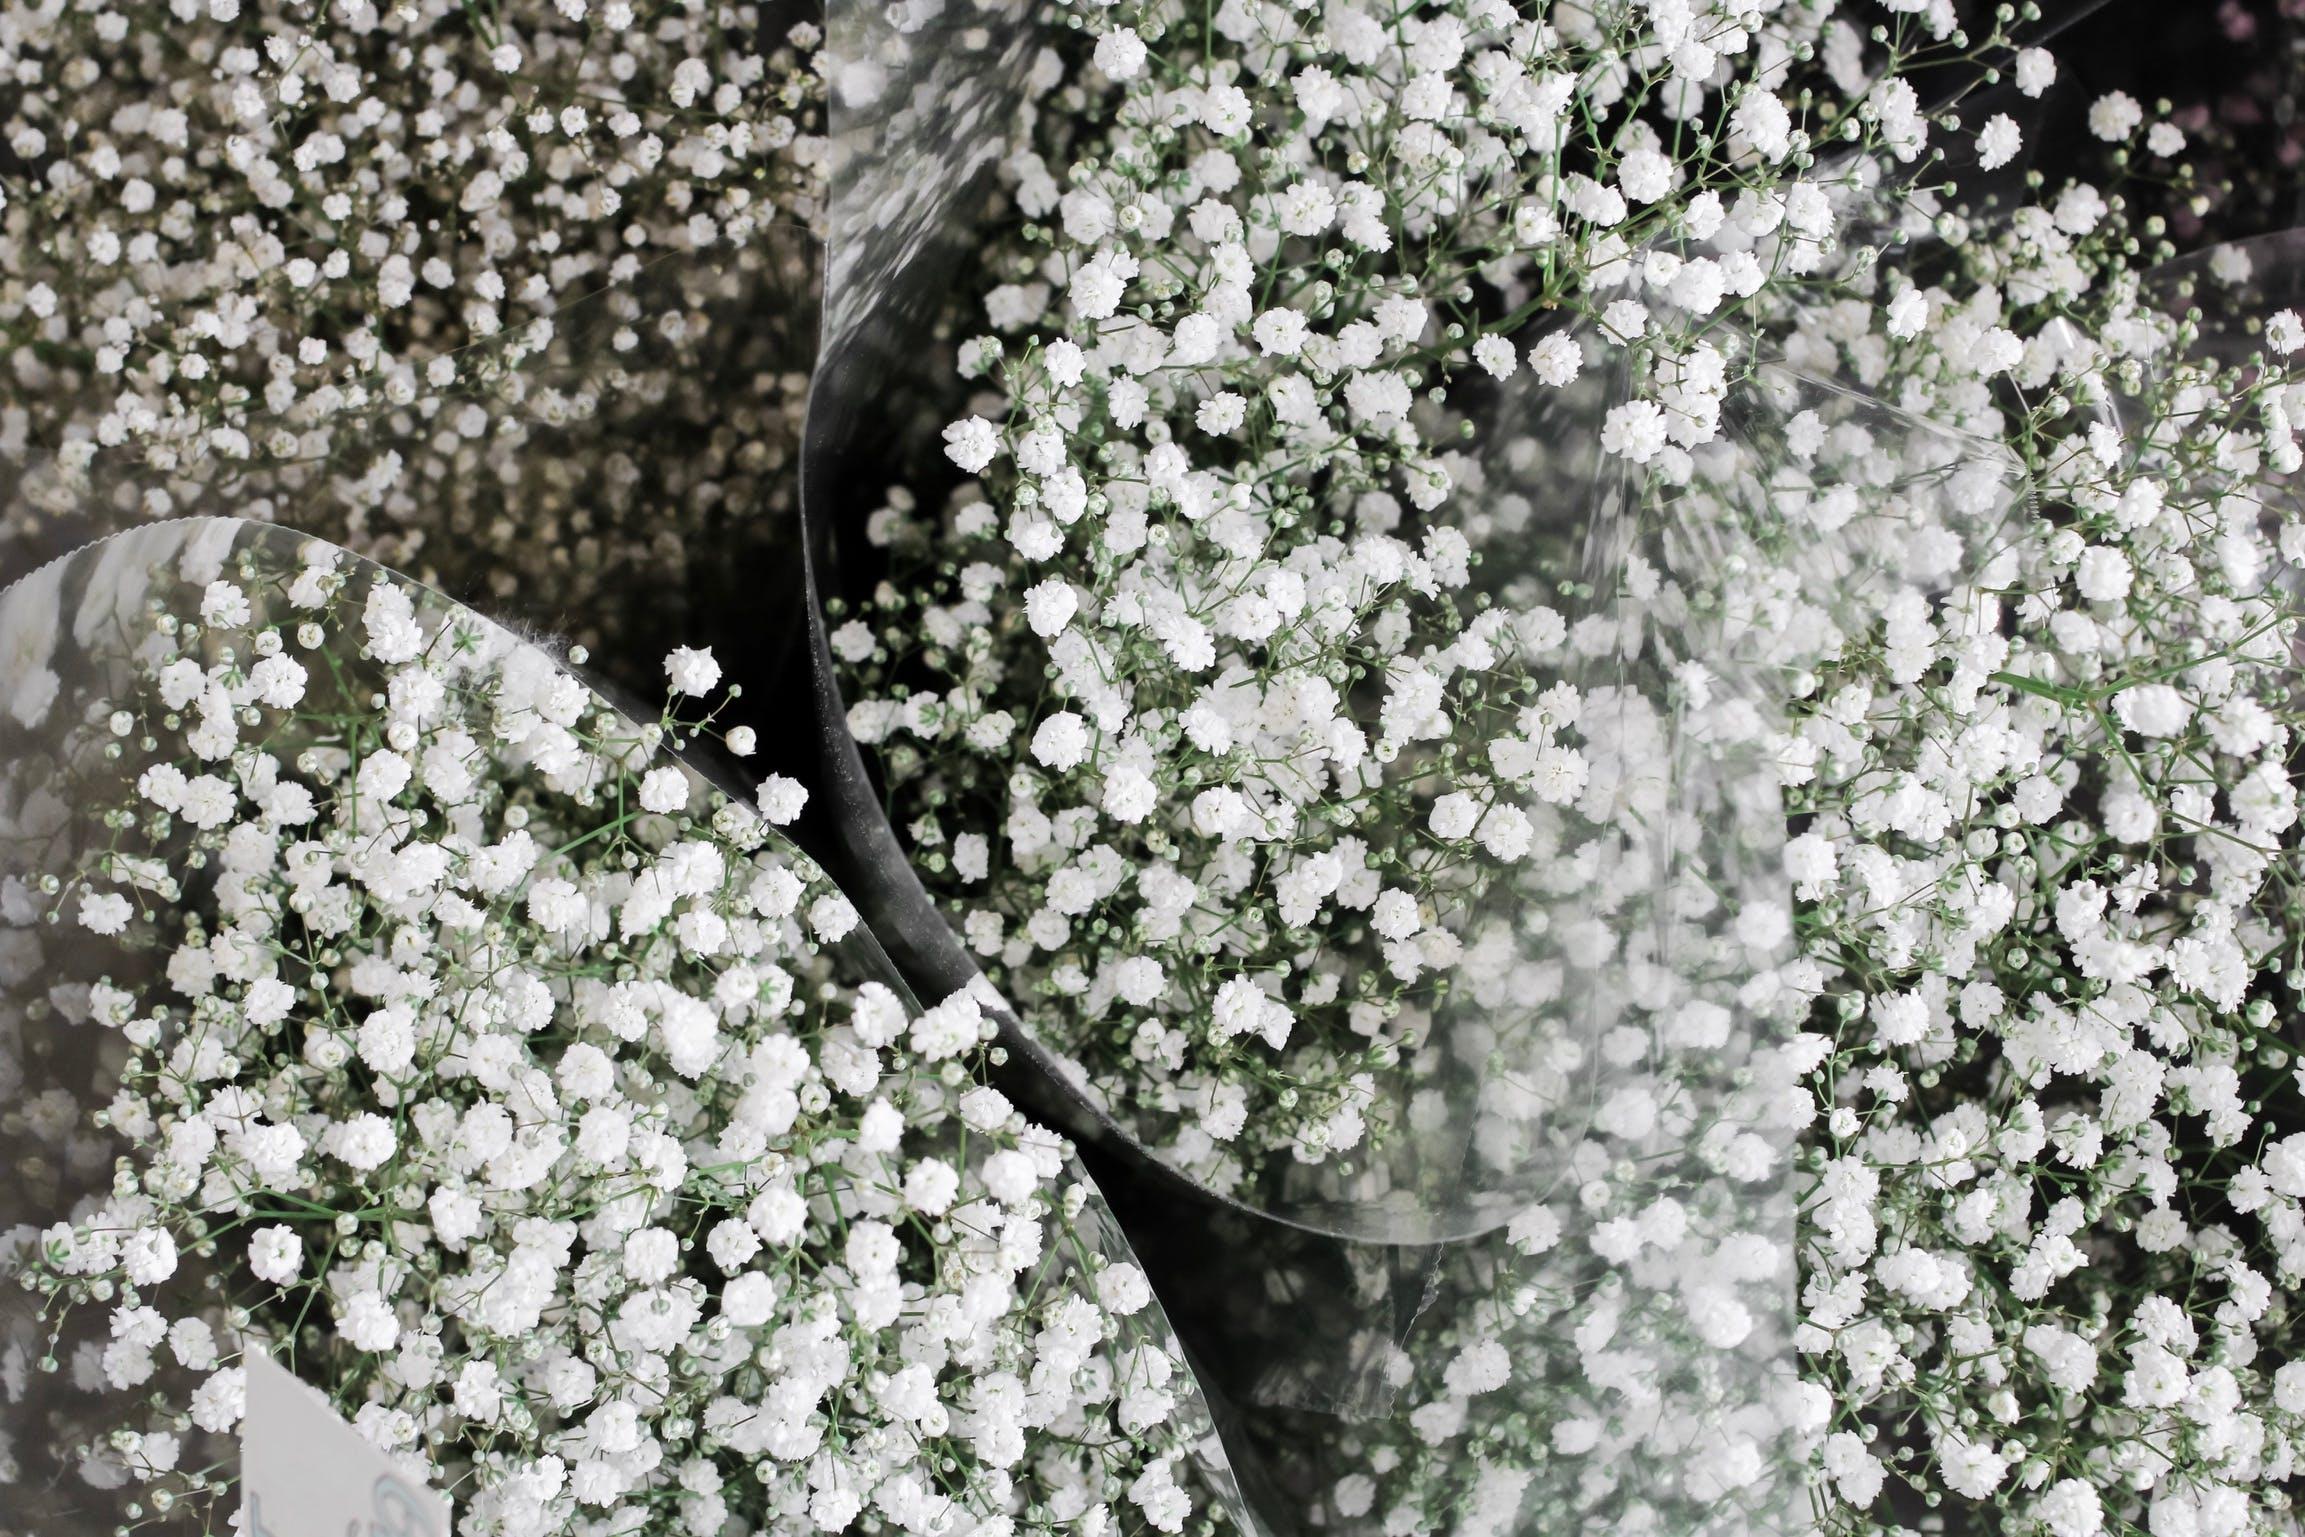 Free stock photo of flowers, flower, beautiful, minimal